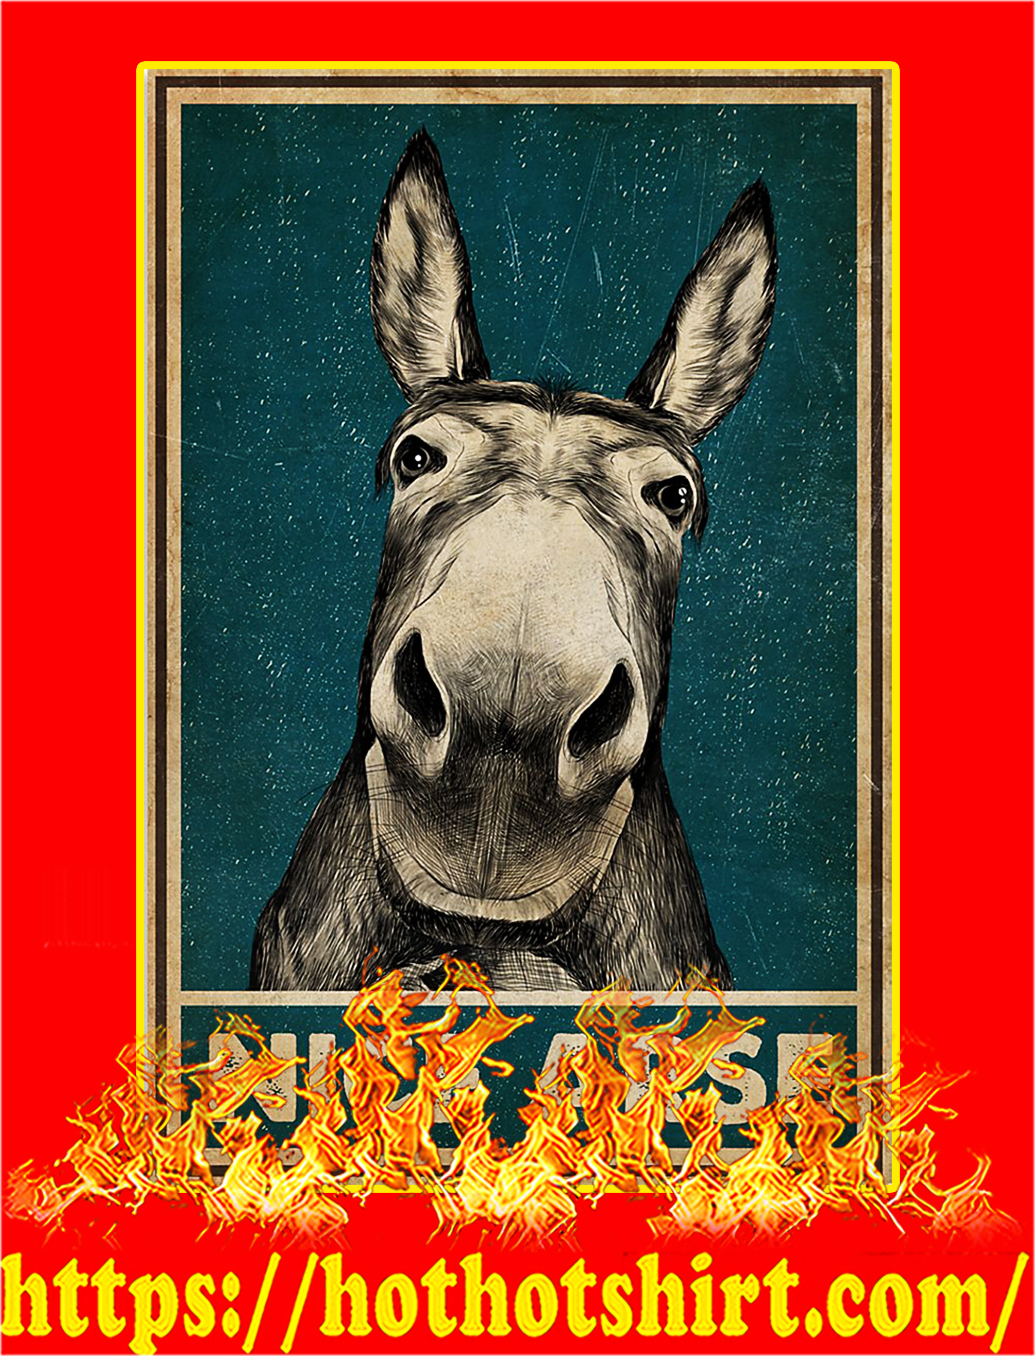 Nice arse donkey poster - A4